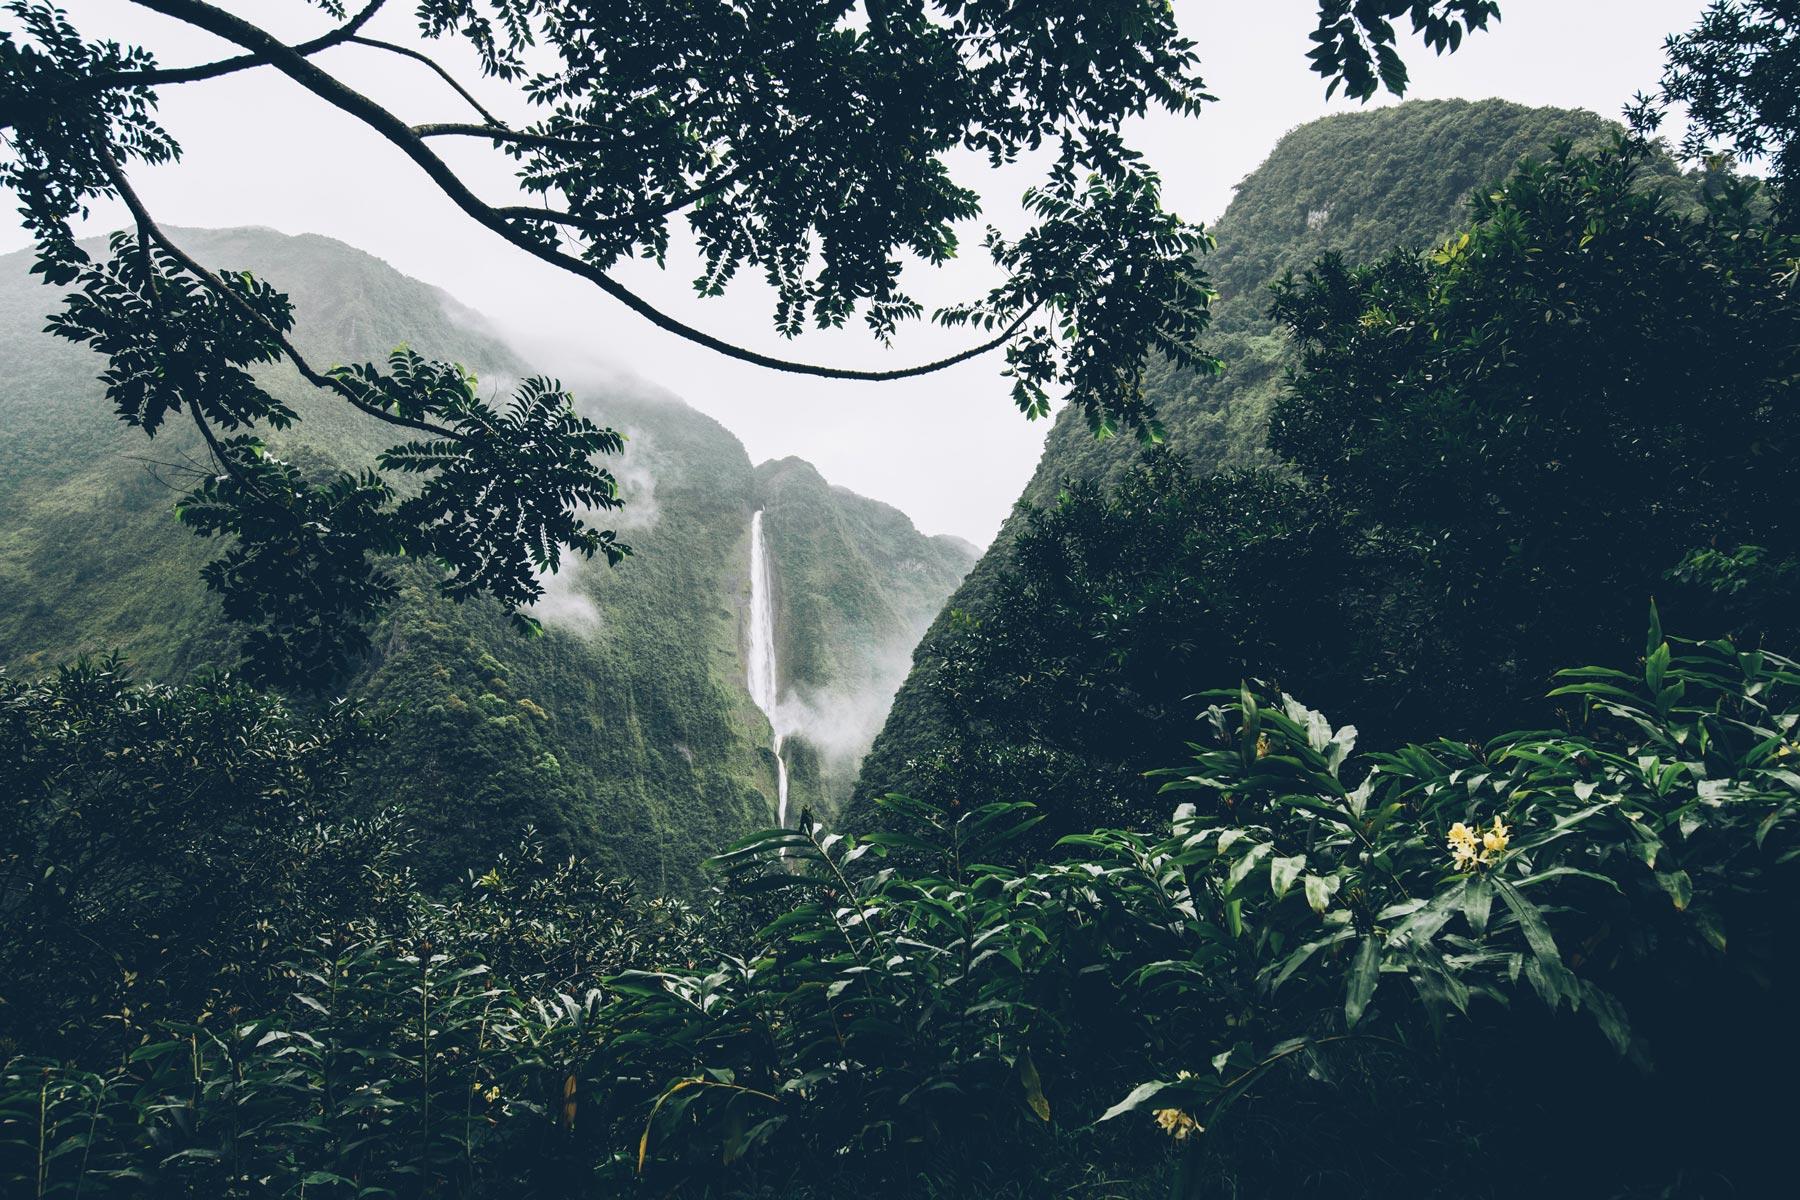 Cascade Blanche, Salazie, Ile de la Réunion